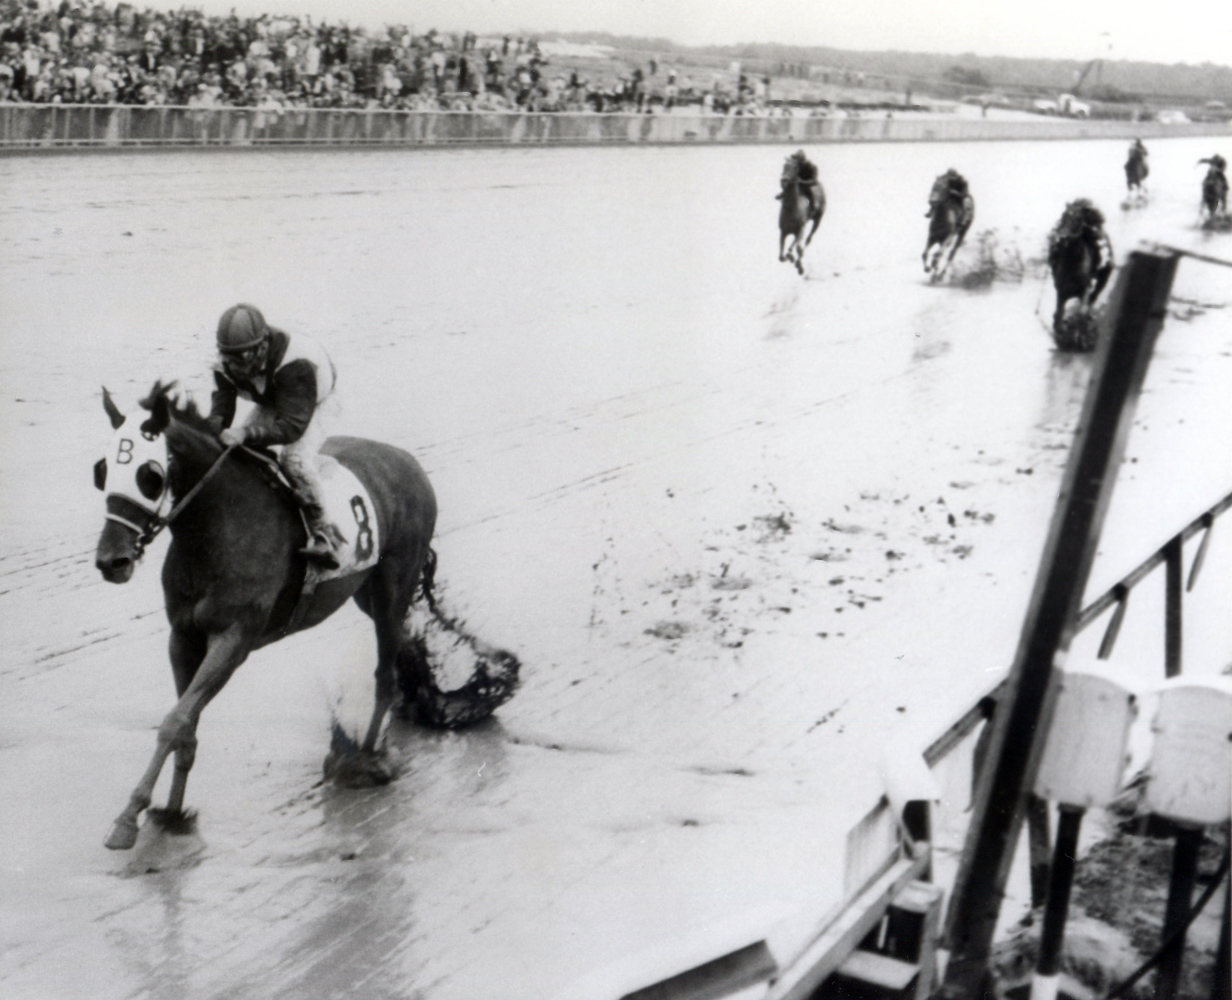 Sam Boulmetis and Tosmah winning the 1963 Mermaid Handicap at Atlantic City (Jim Raftery Turfotos/Museum Collection)